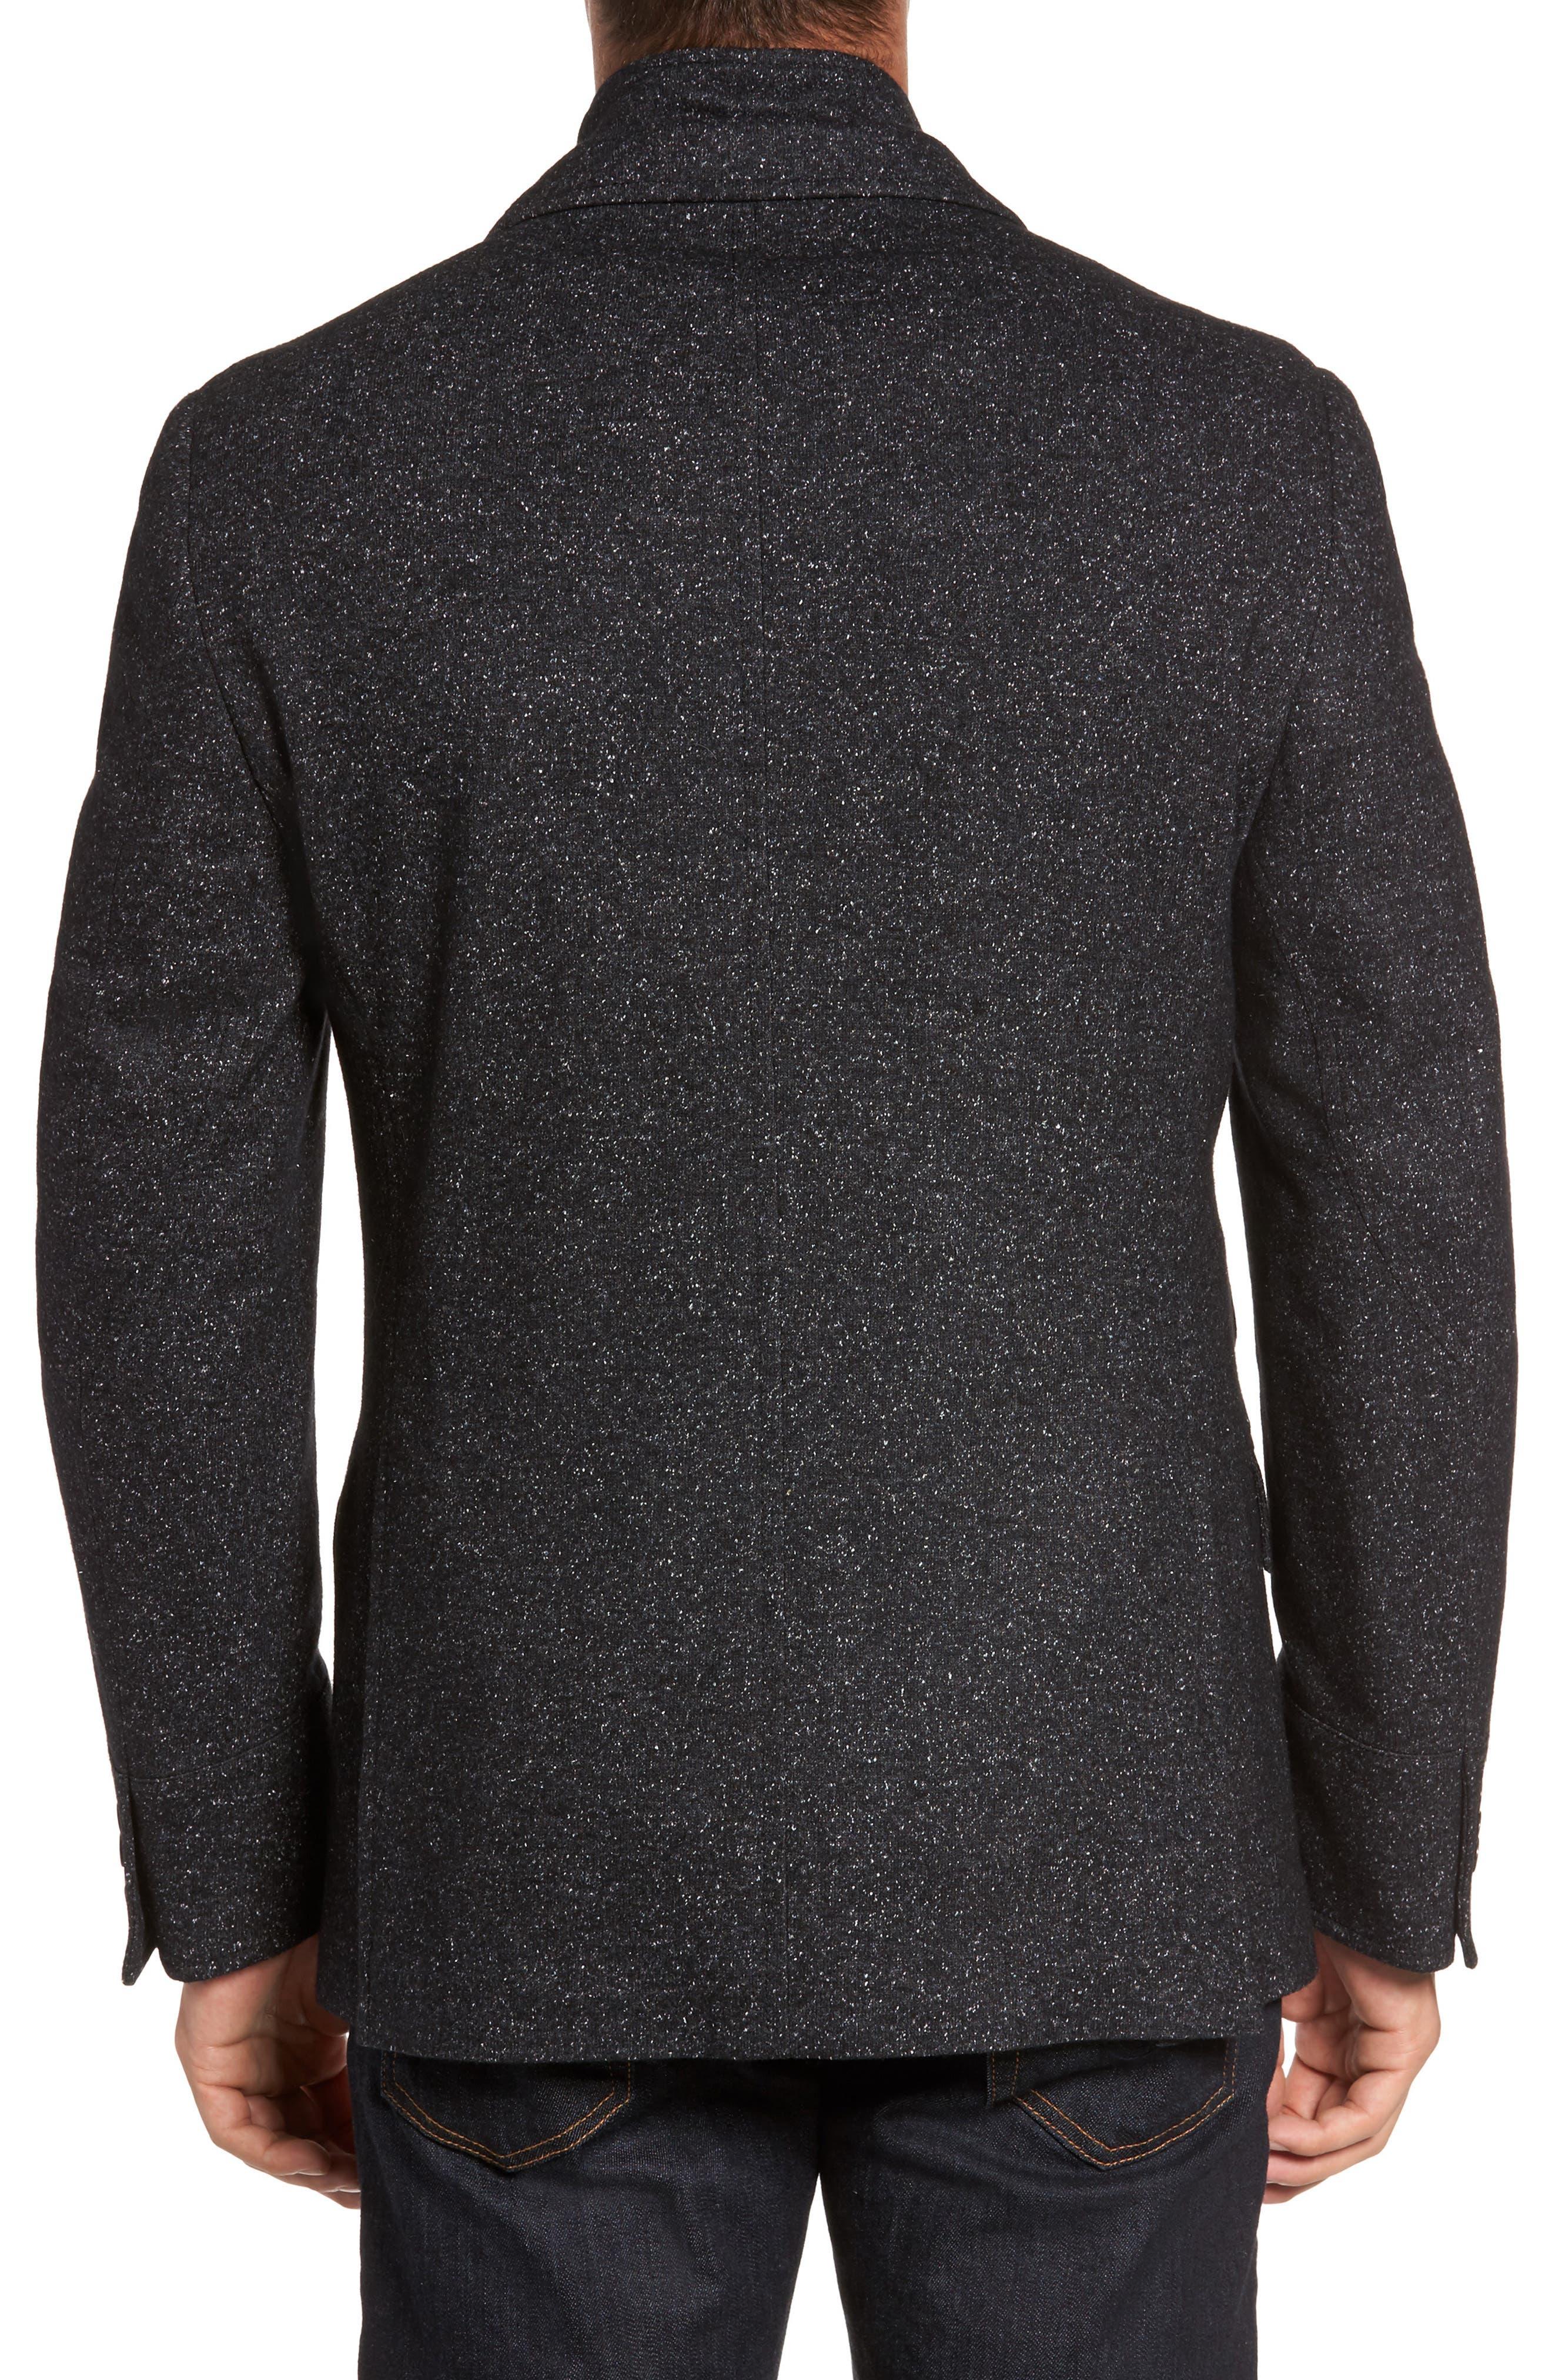 Donegal Wool Blend Hybrid Coat,                             Alternate thumbnail 2, color,                             021